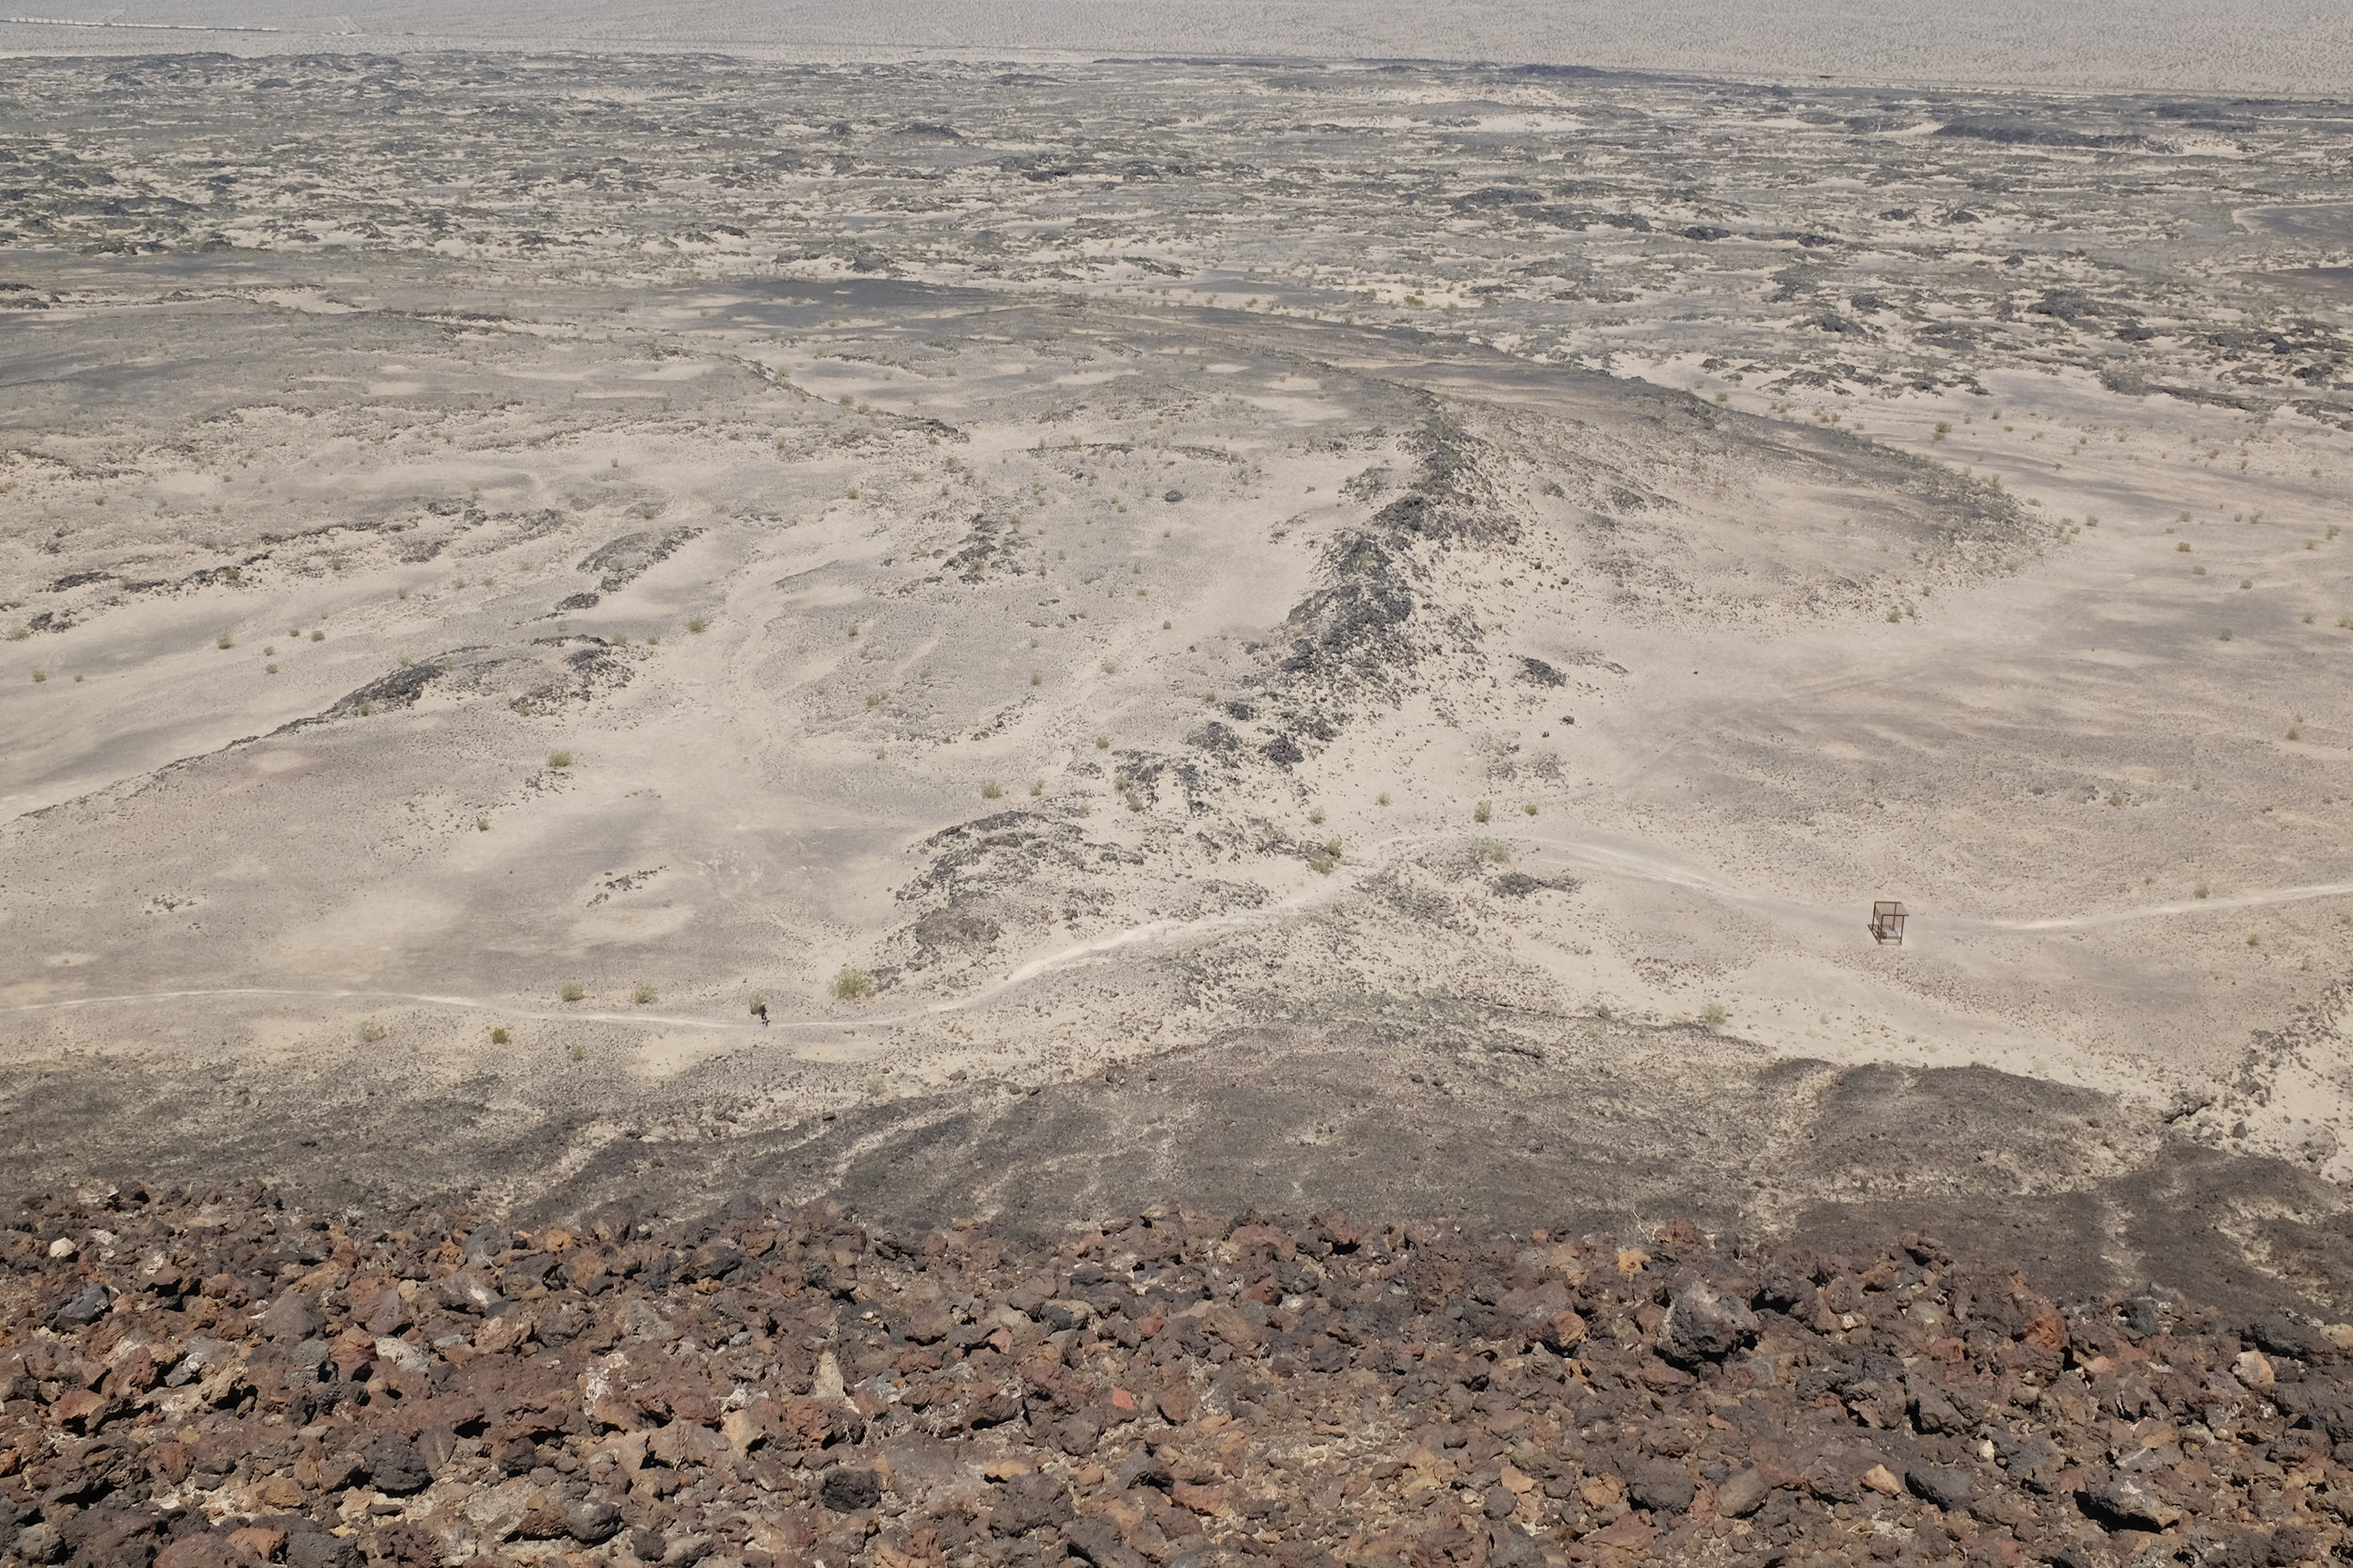 CraterBench.jpg